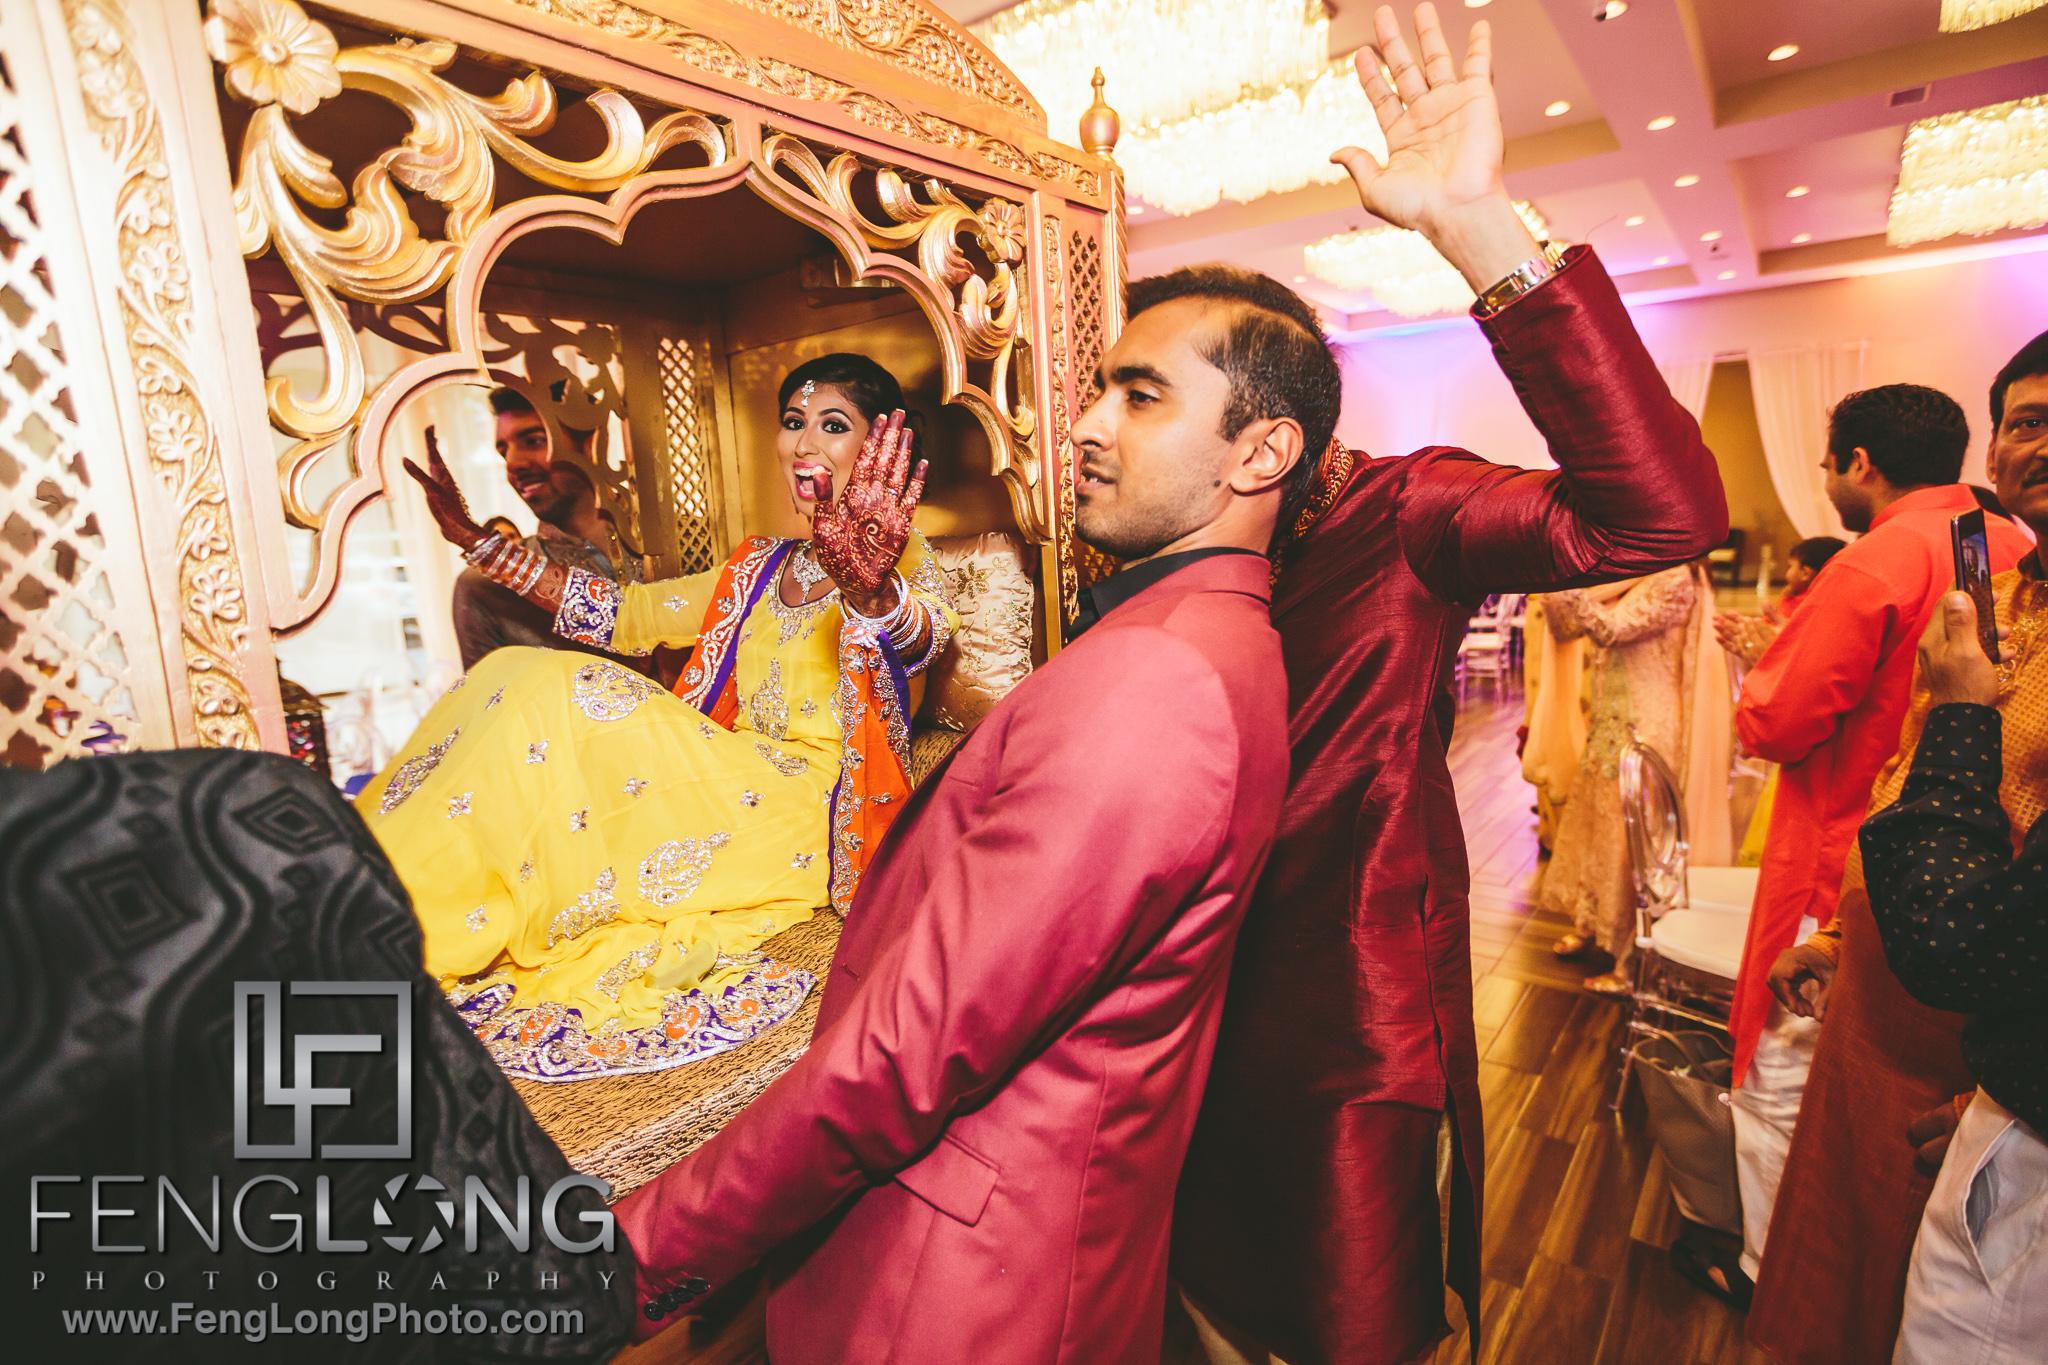 atlanta-indian-wedding-sangeet-opal-event-hall-326502